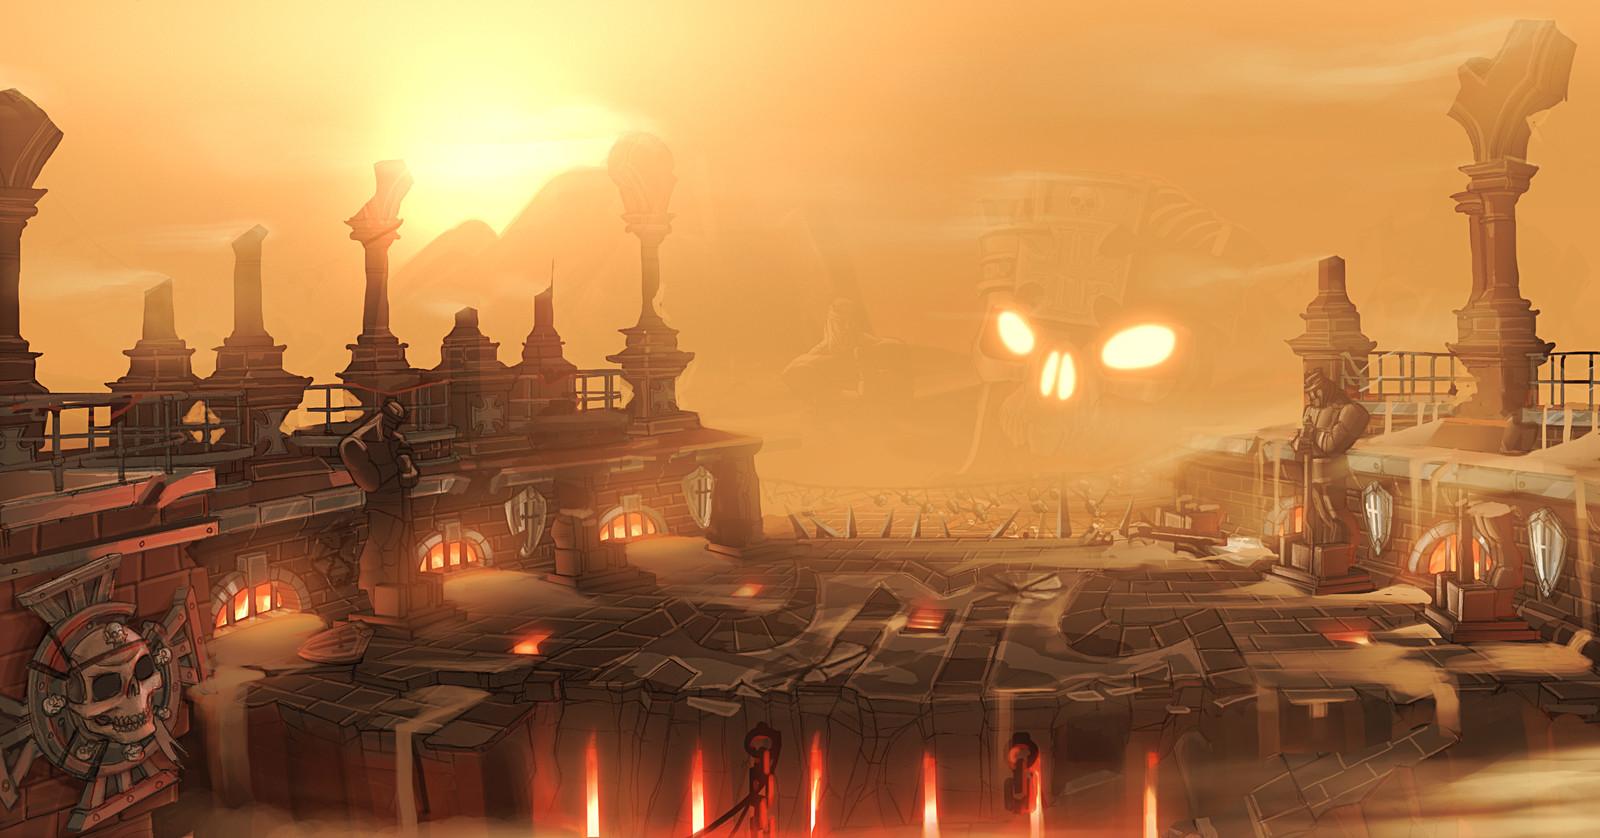 A sandstorm envelops an arena